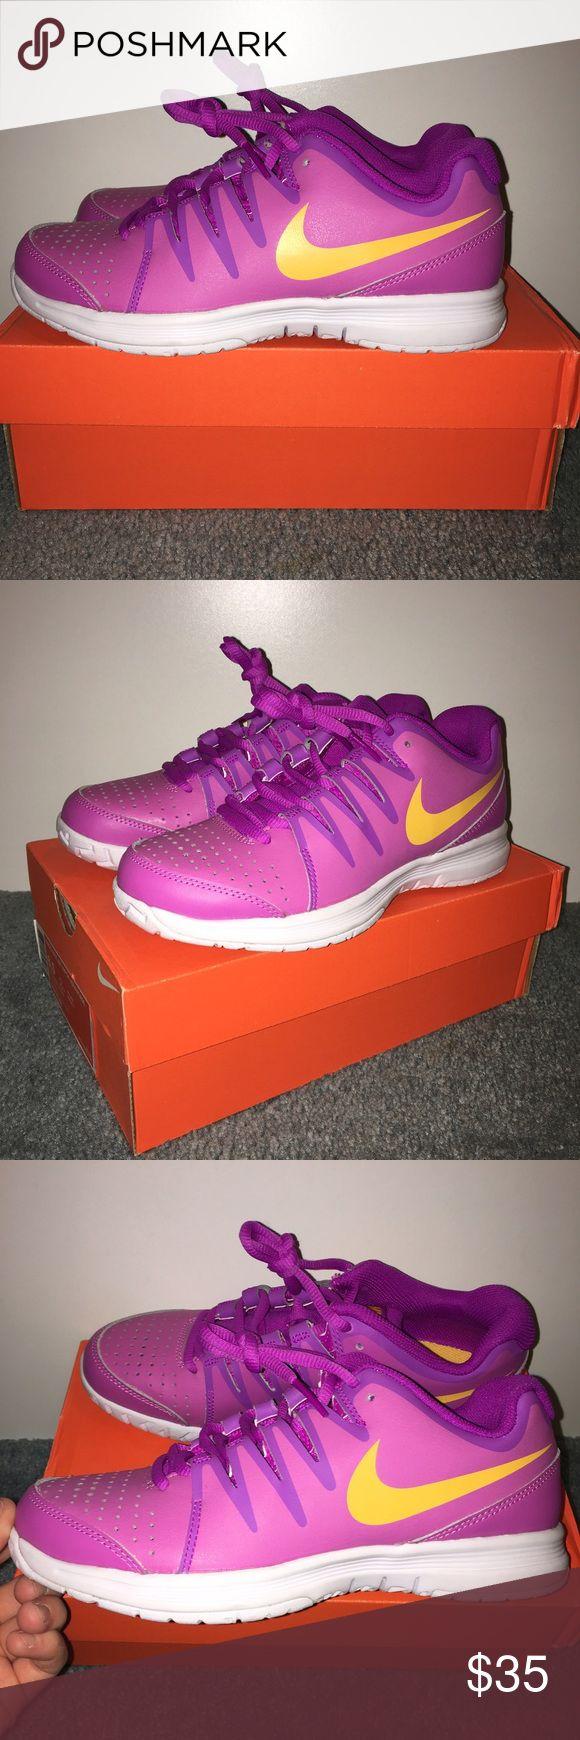 Nike tennis court shoes size 6.5 Brand new  Purple & mango Nike tennis athletic shoes  Women's size 6.5 Women's Nike vapor court Nike Shoes Athletic Shoes